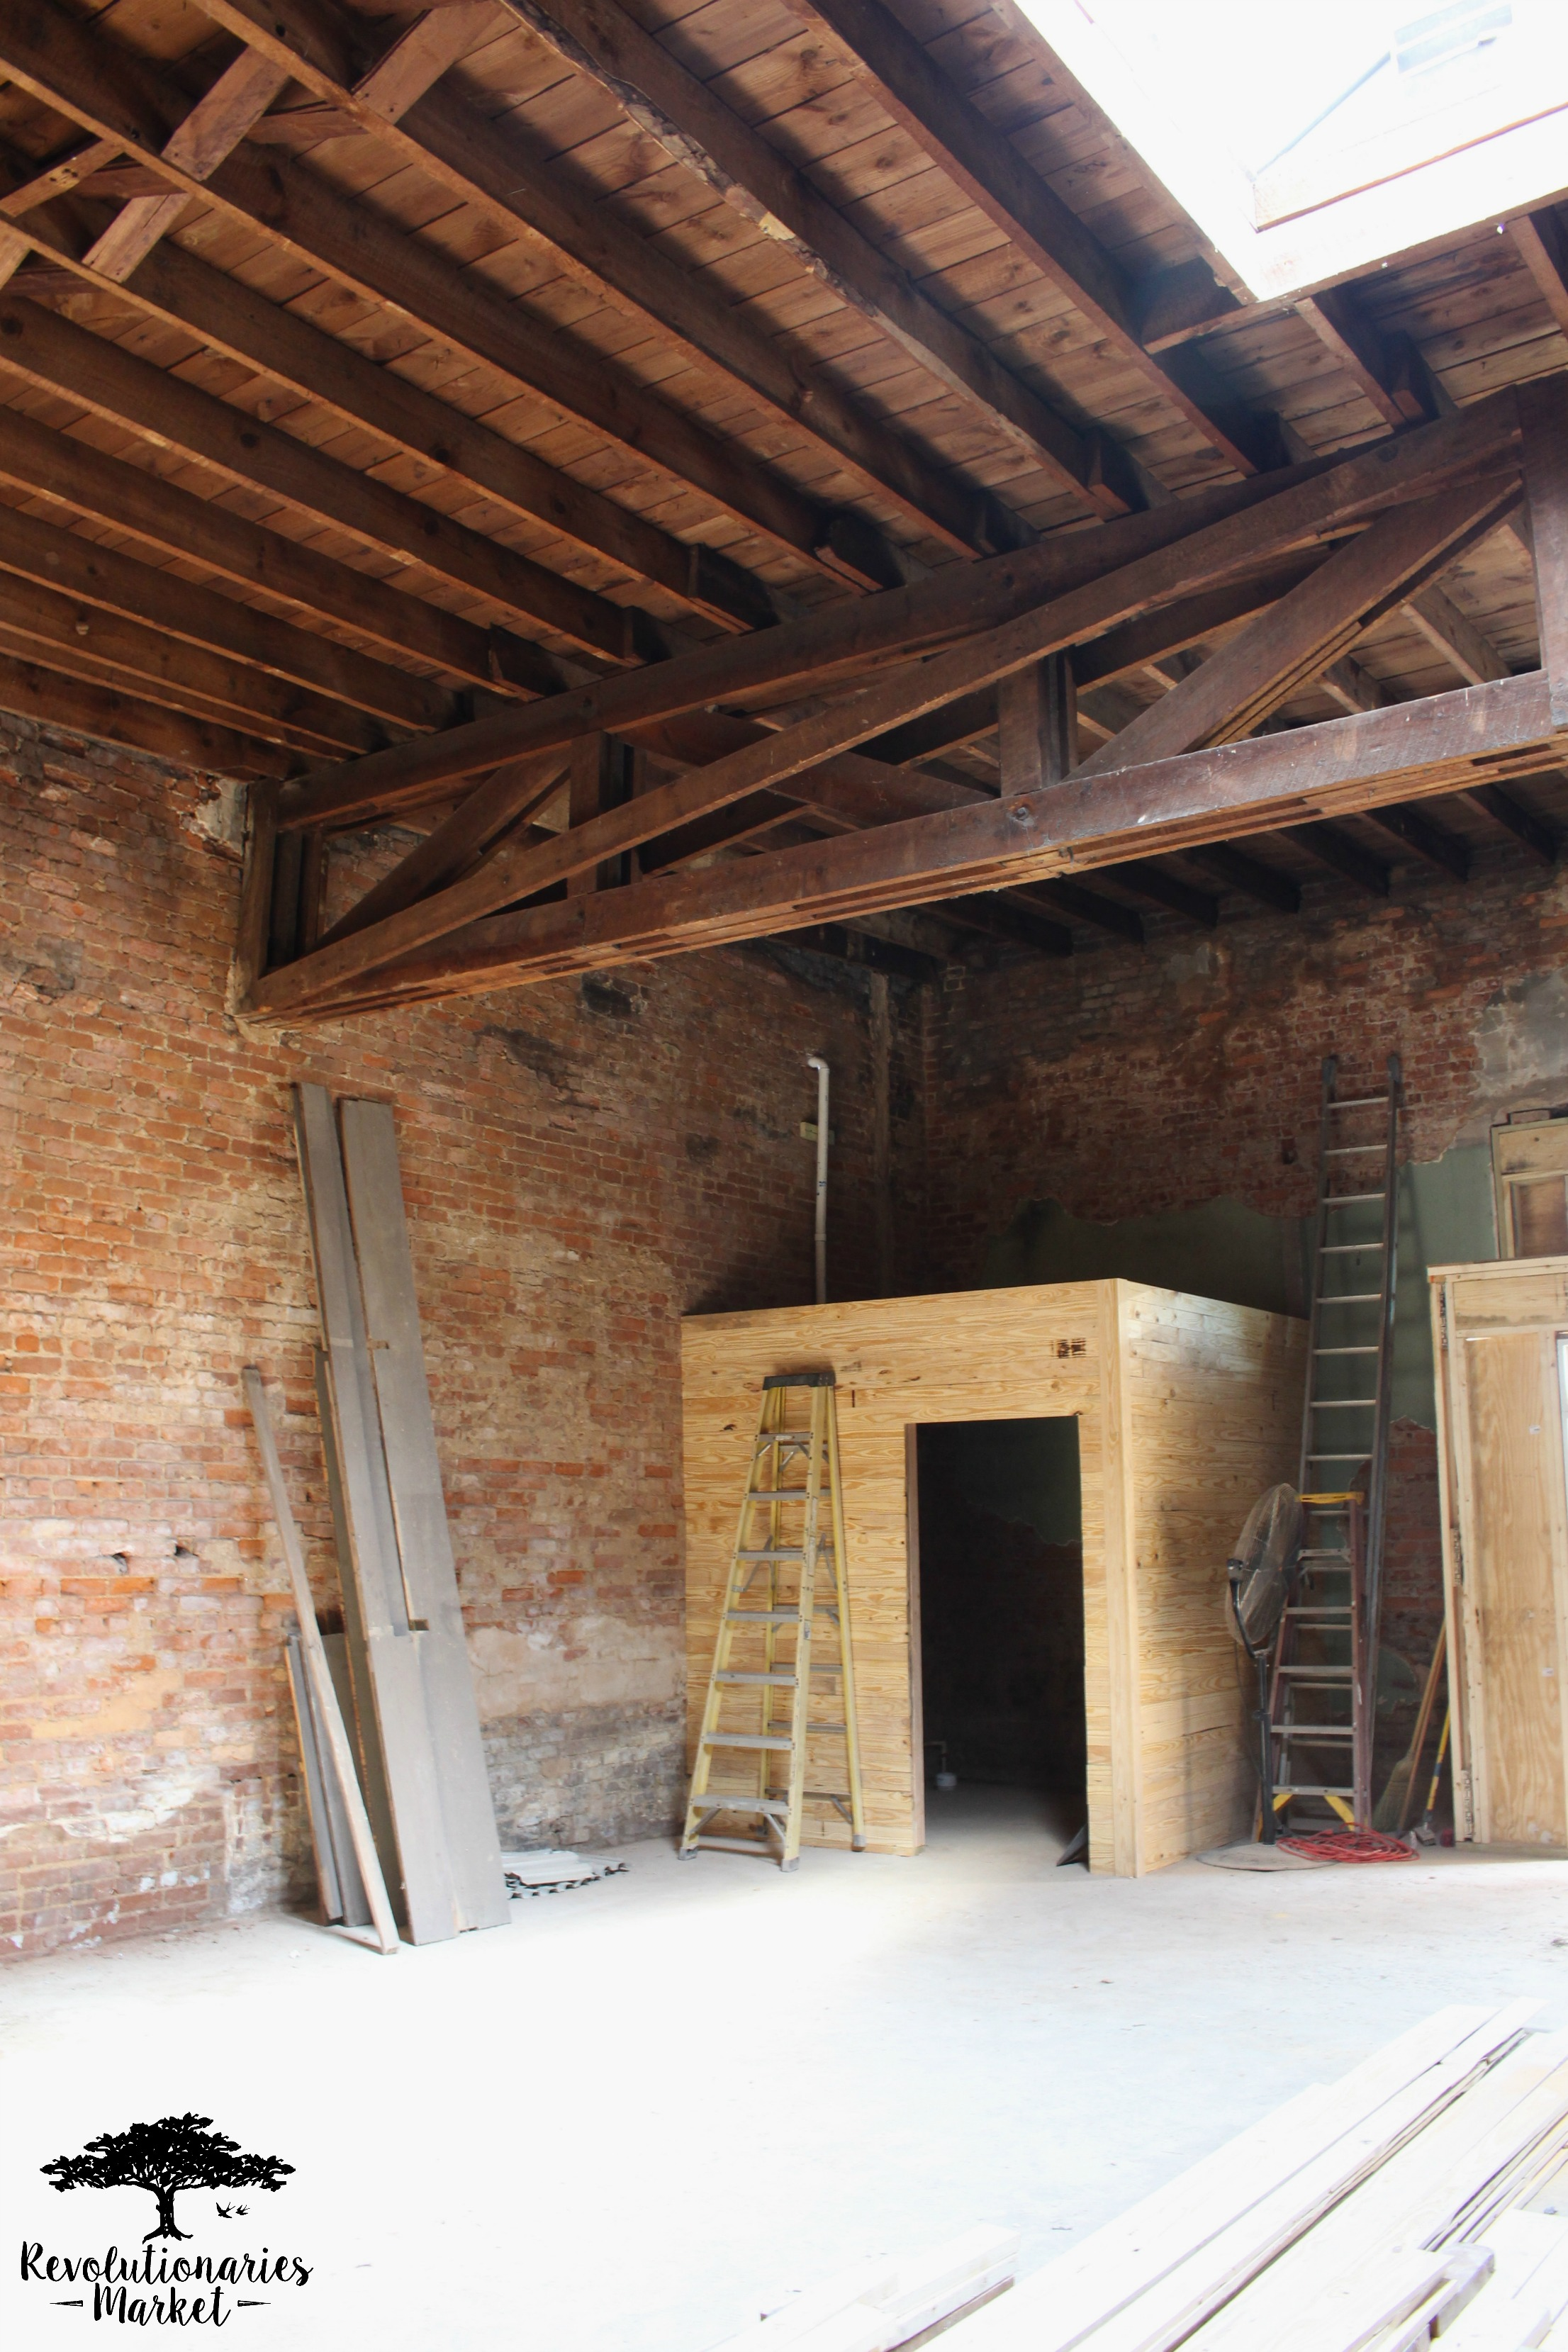 Revolutionaries Market Renovation: Update #2